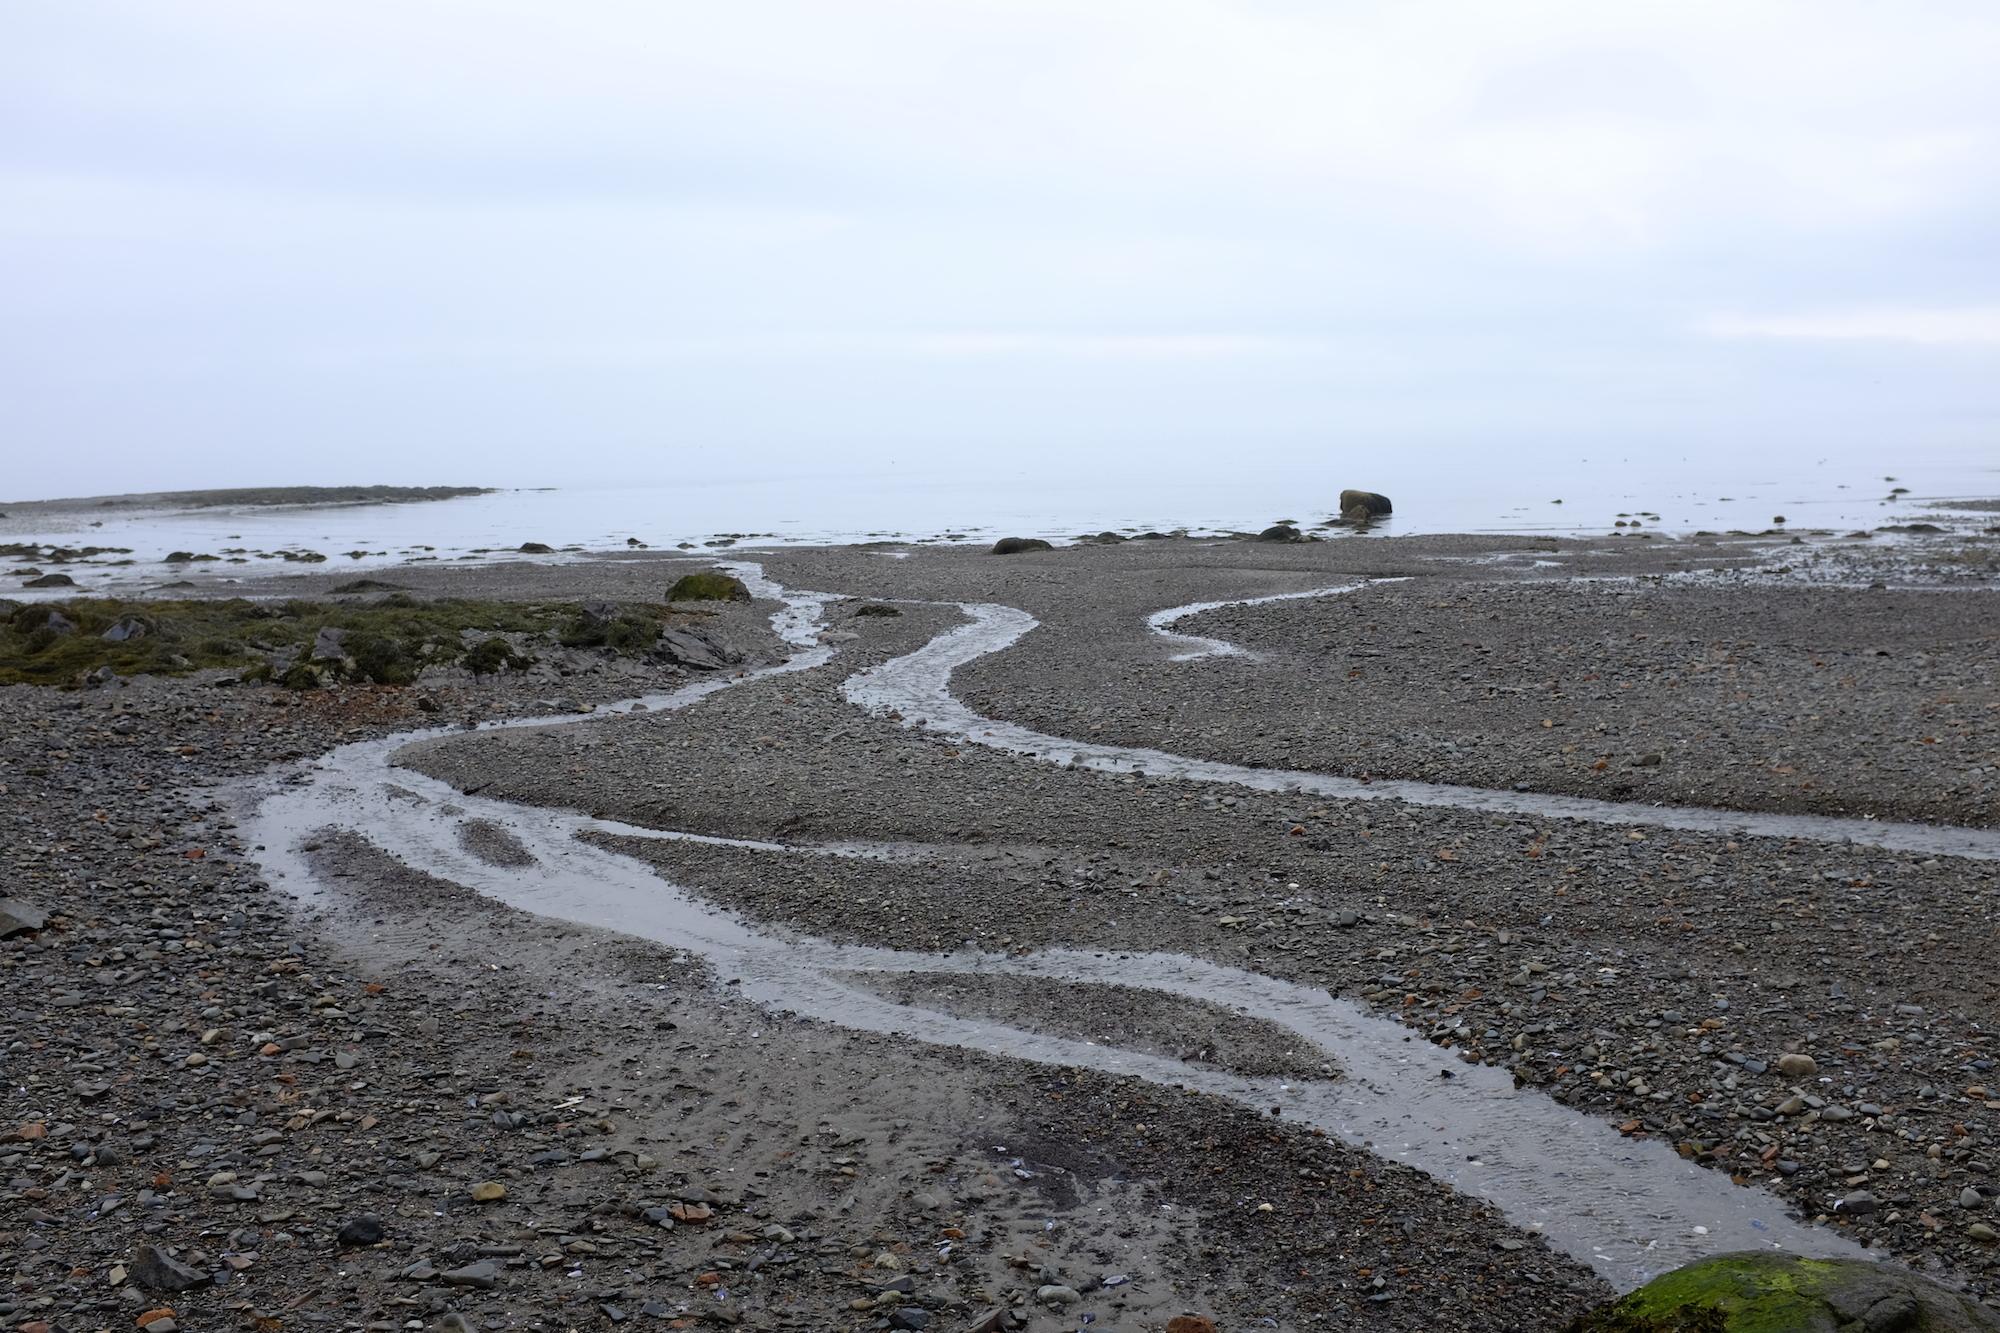 Hulls Cove Beach, Composition 3